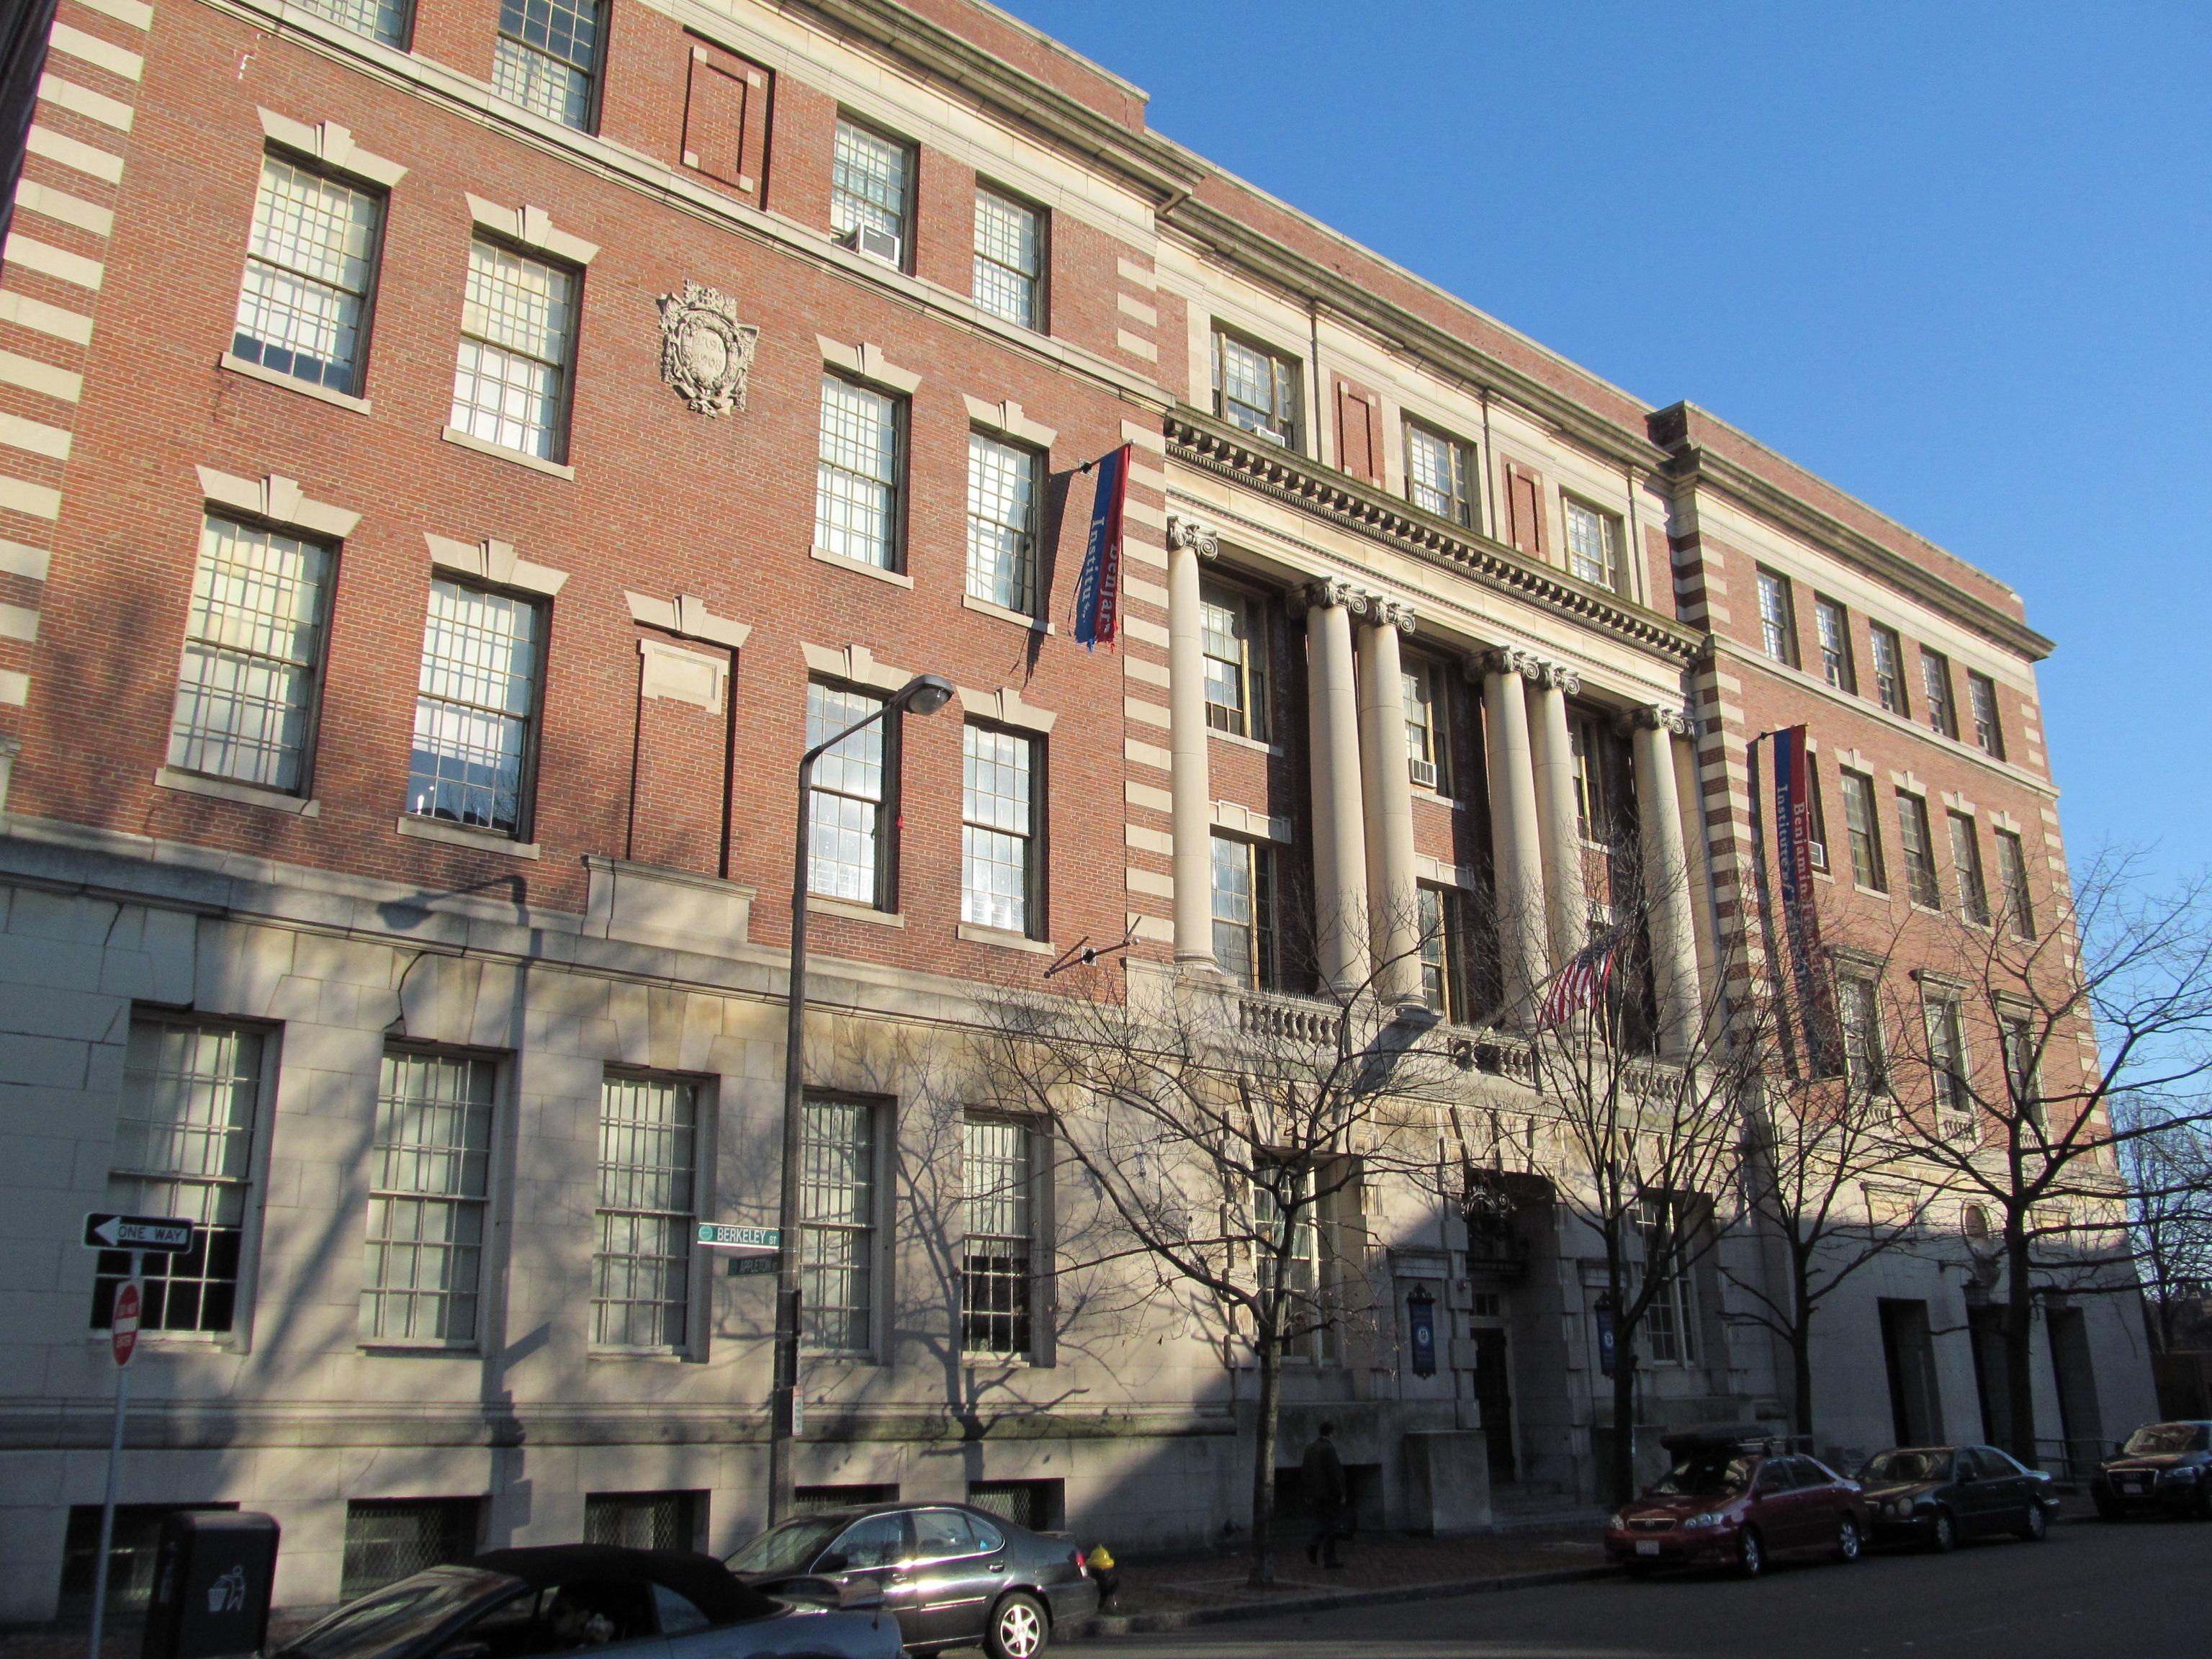 Benjamin Franklin Institute of Technology - Wikipedia